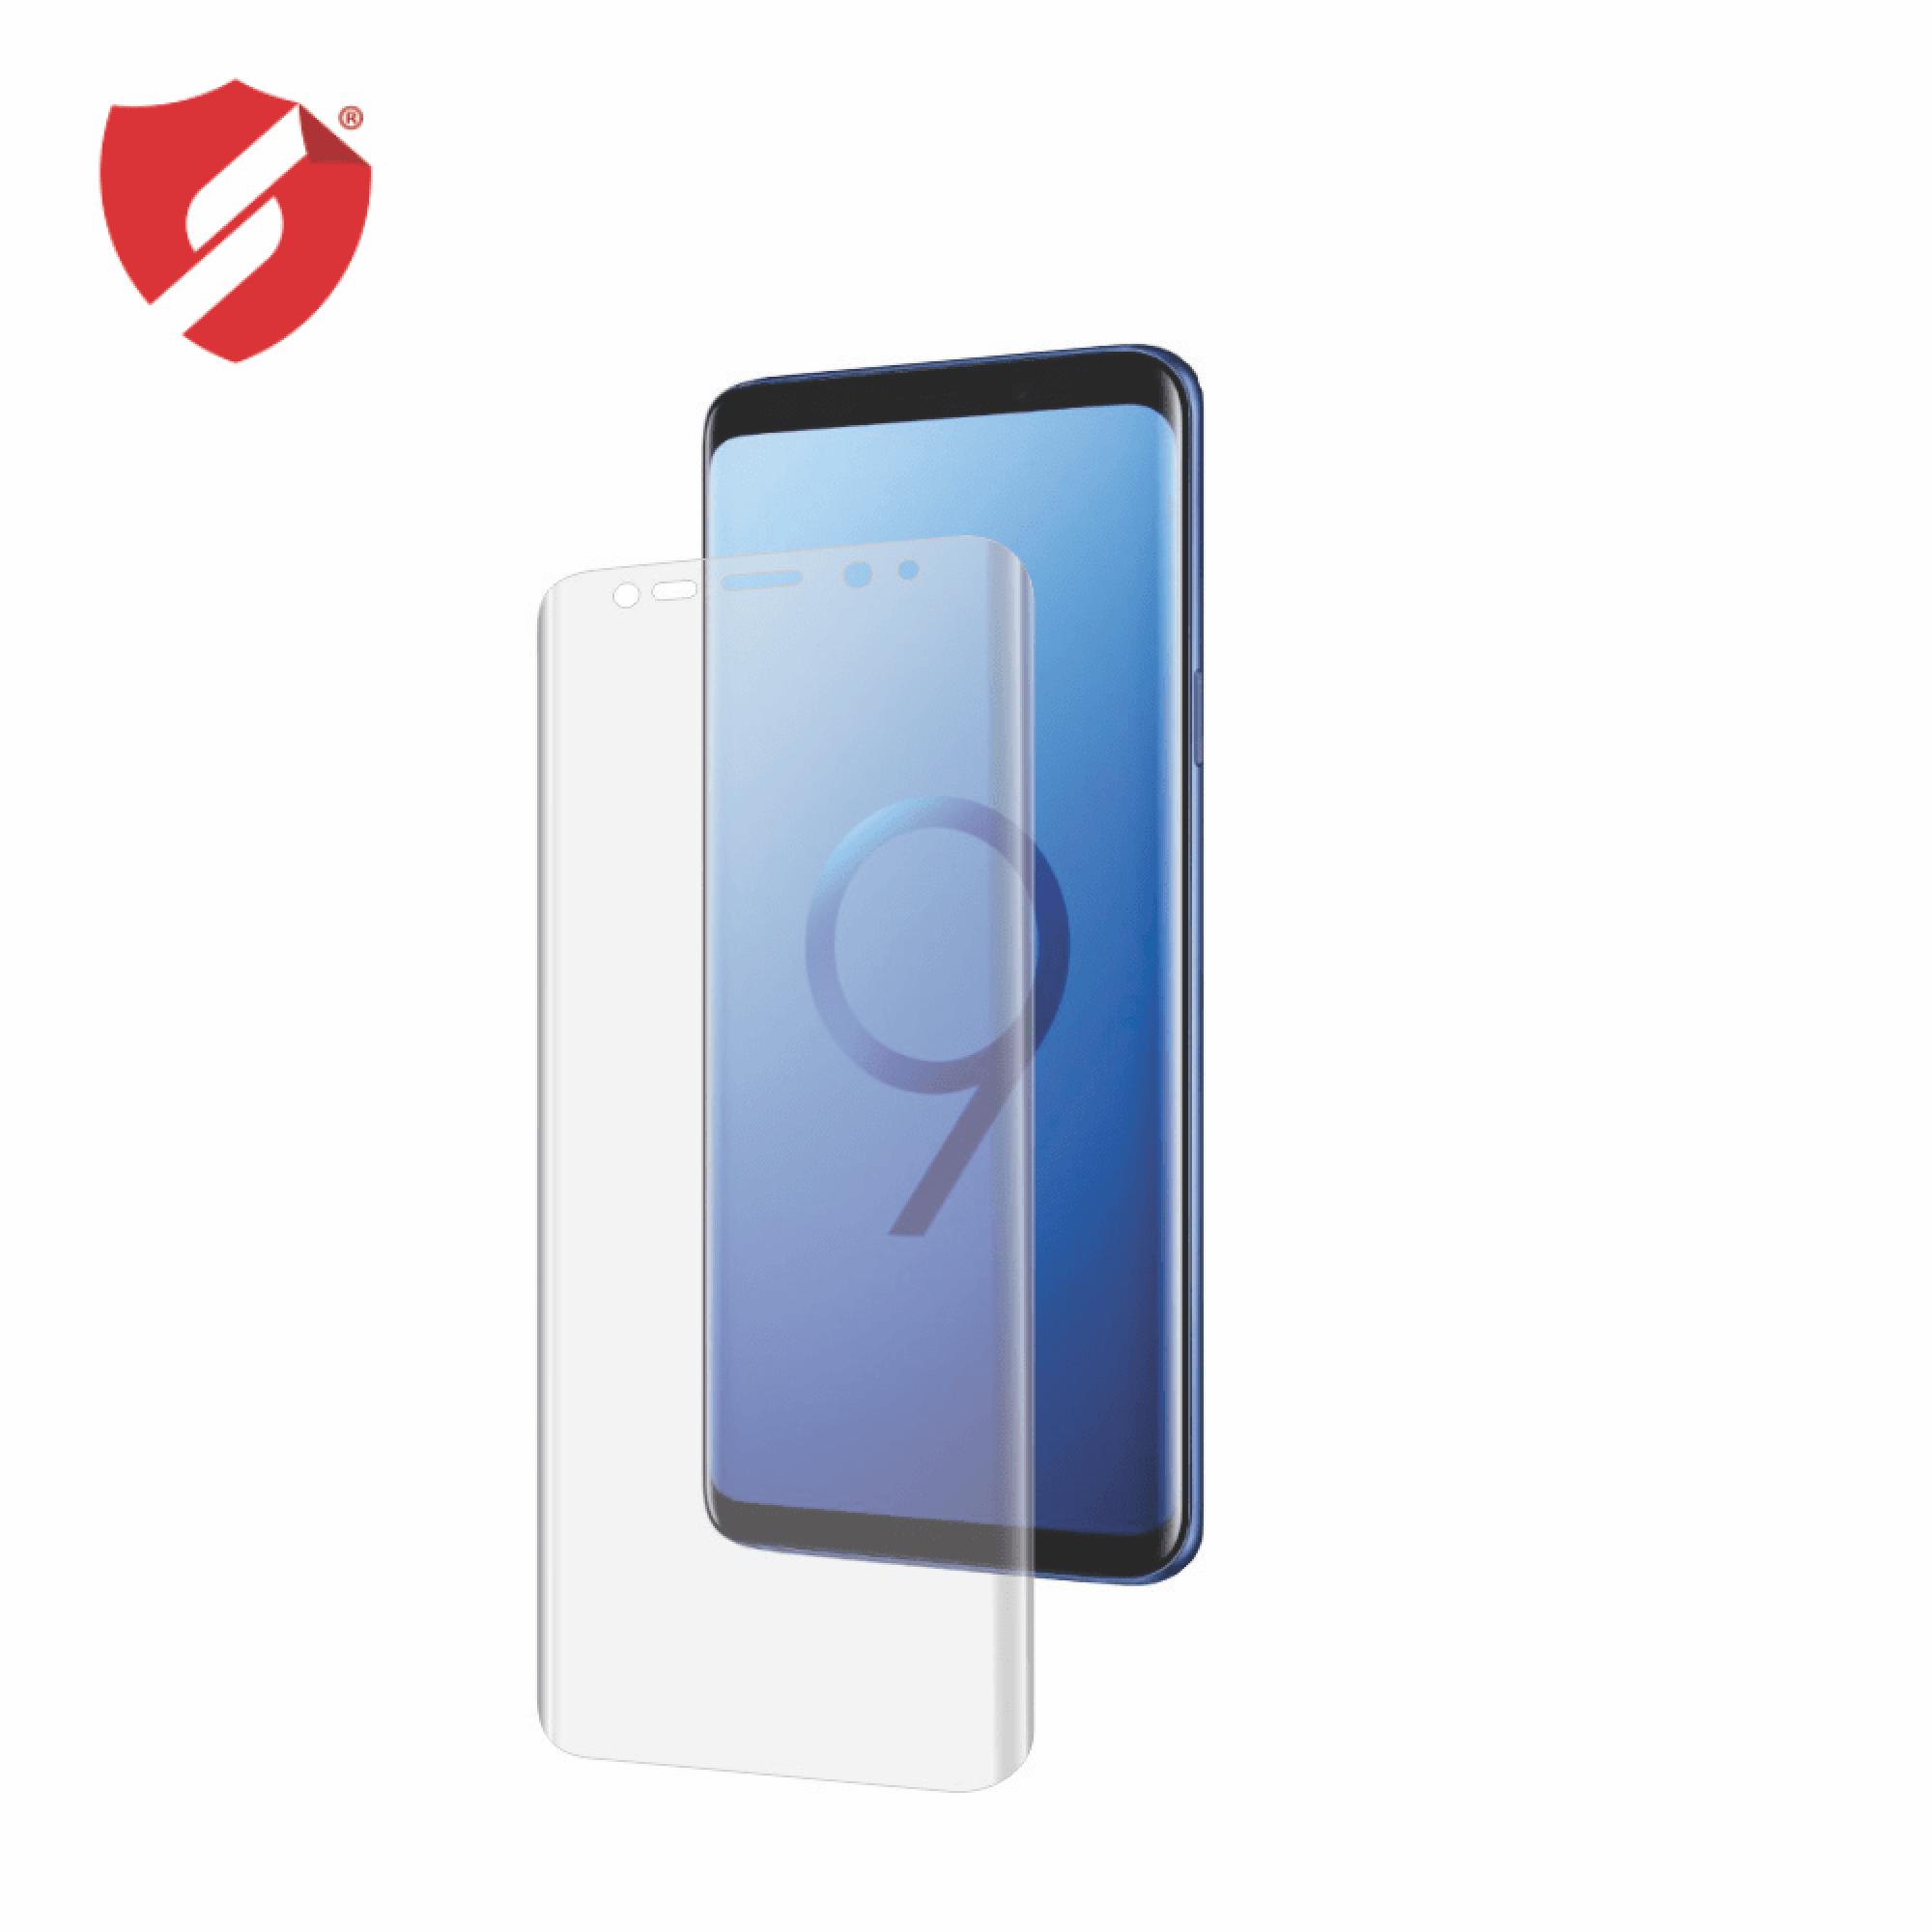 Folie de protectie Smart Protection Samsung Galaxy S9 compatibila cu carcasa Spigen Neo Hybrid - doar-display imagine